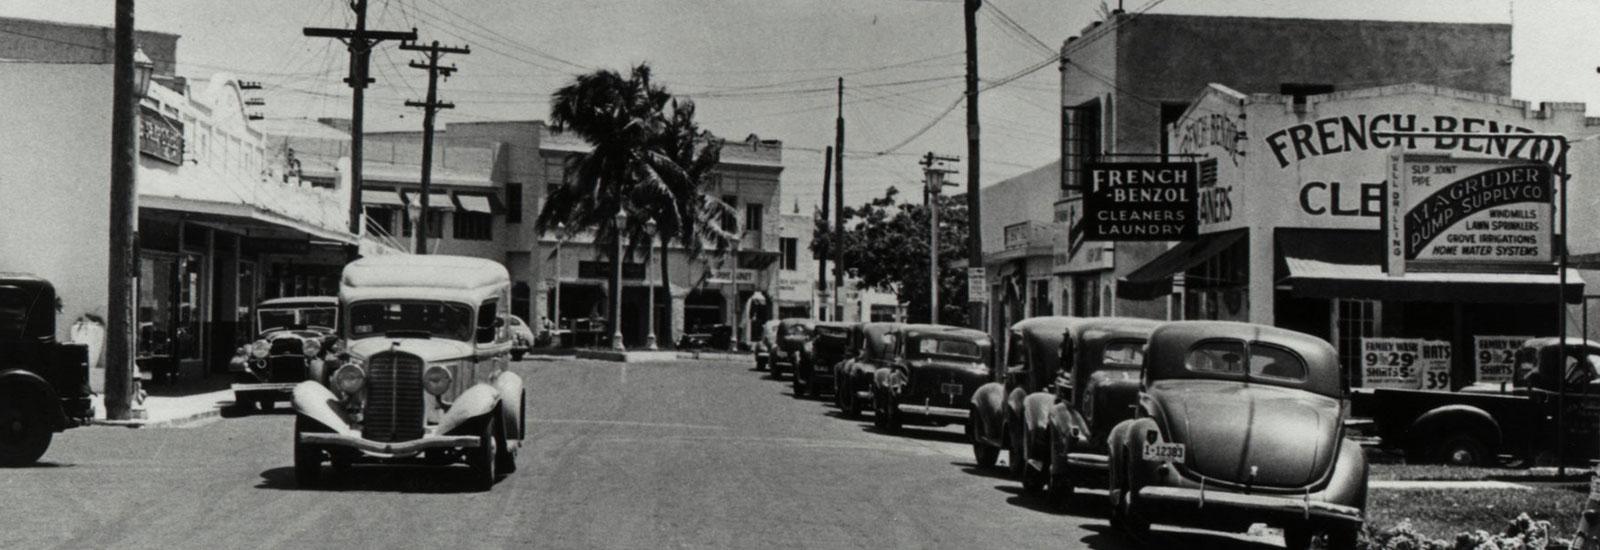 Historic Coconut Grove Photo source: http://www.coconutgrove.com/history/